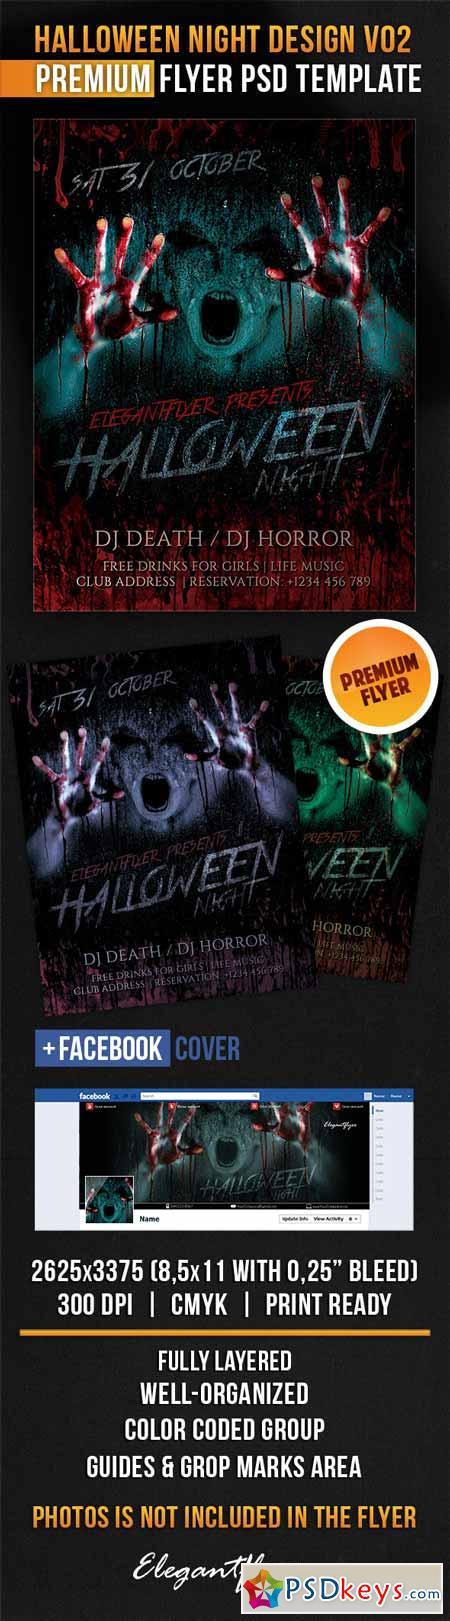 Halloween Night Design V02 – Flyer PSD Template + Facebook Cover